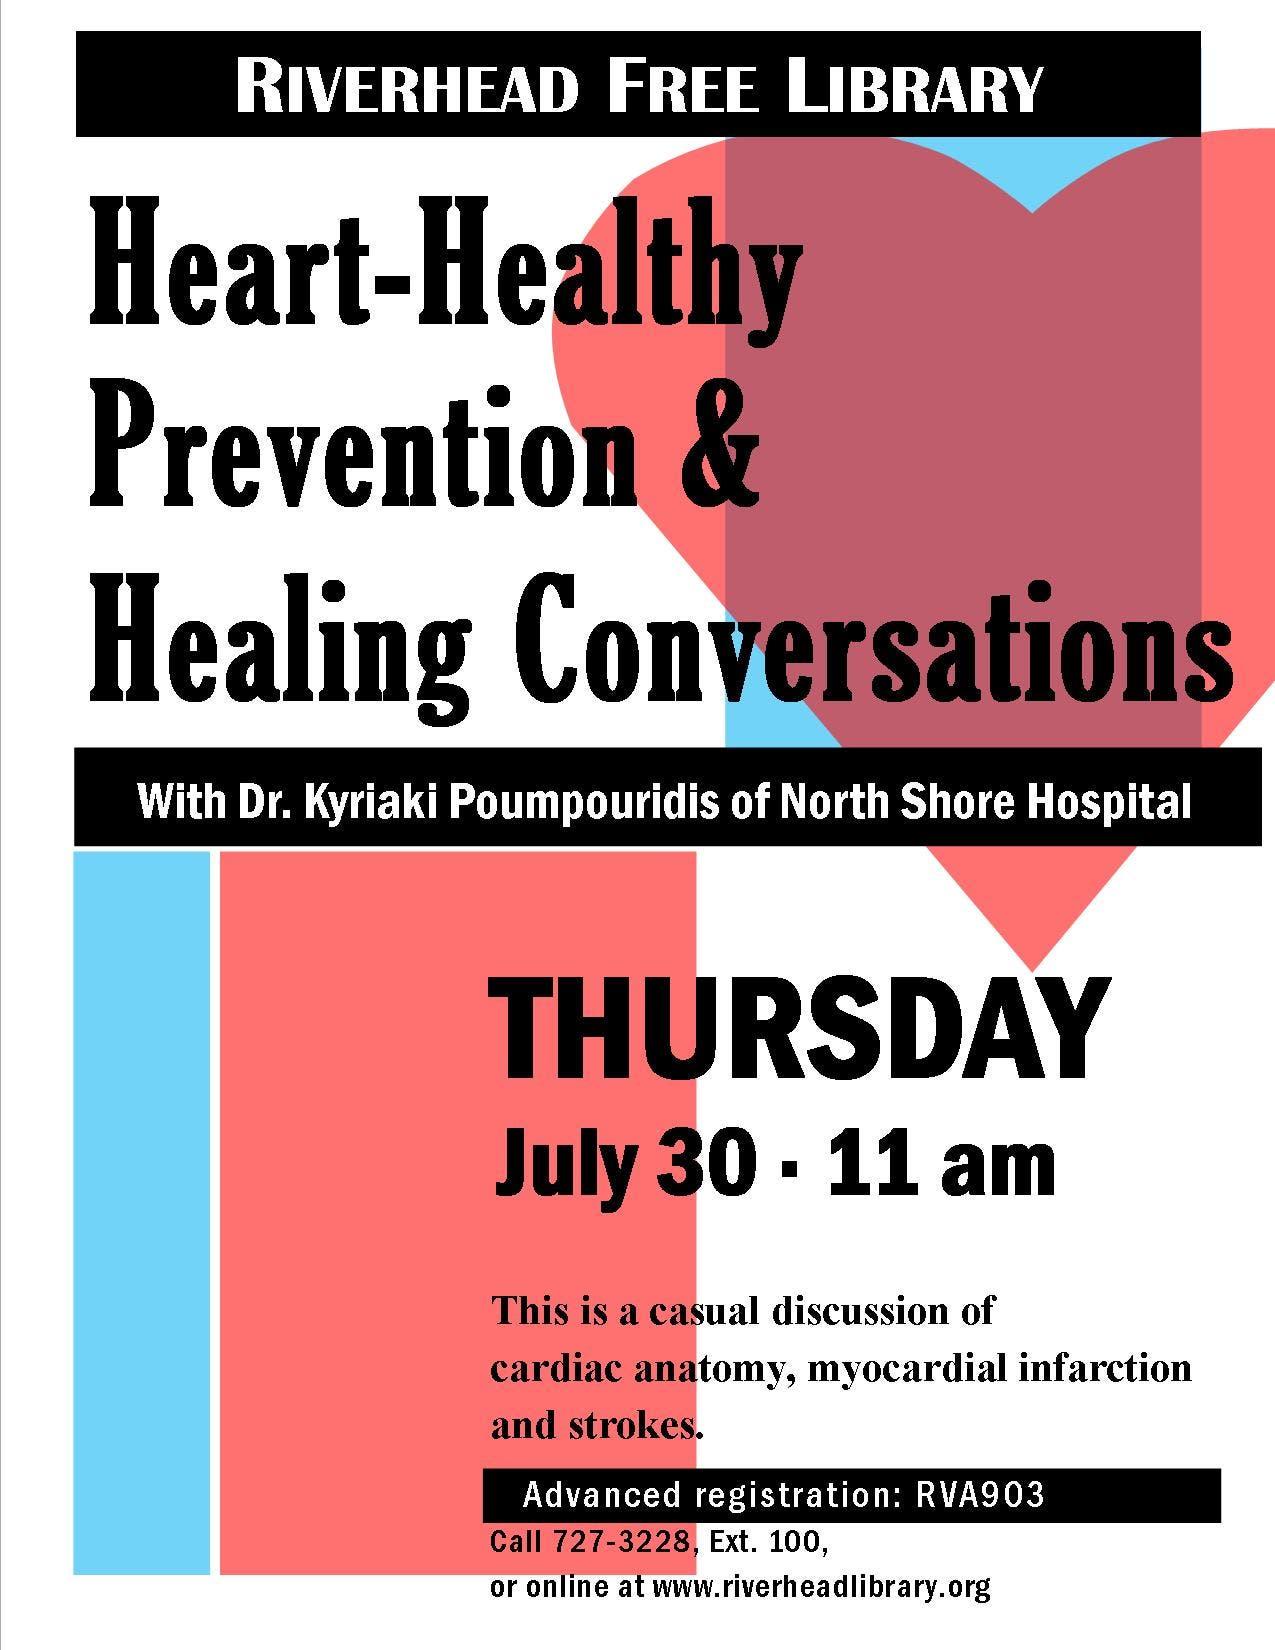 Heart Healthy Prevention & Healing Conversations | Riverhead